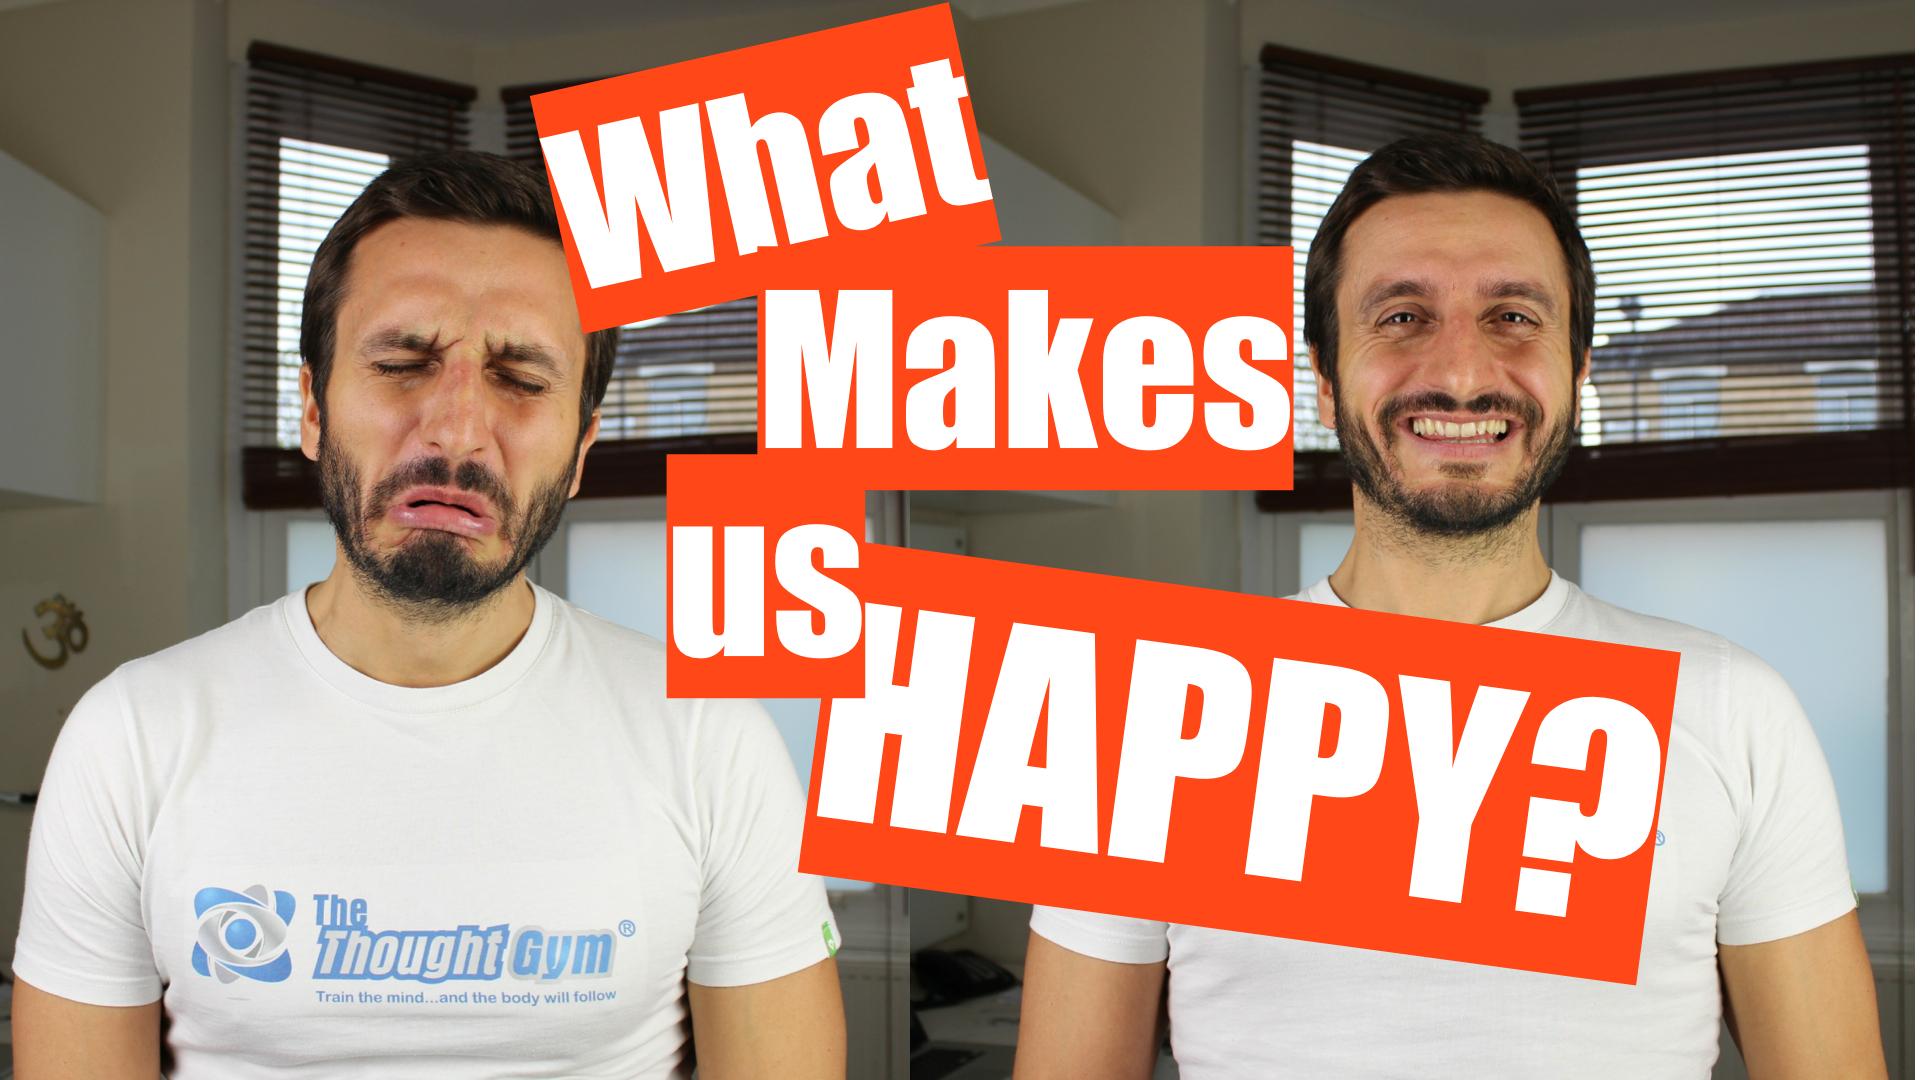 What makes us happy